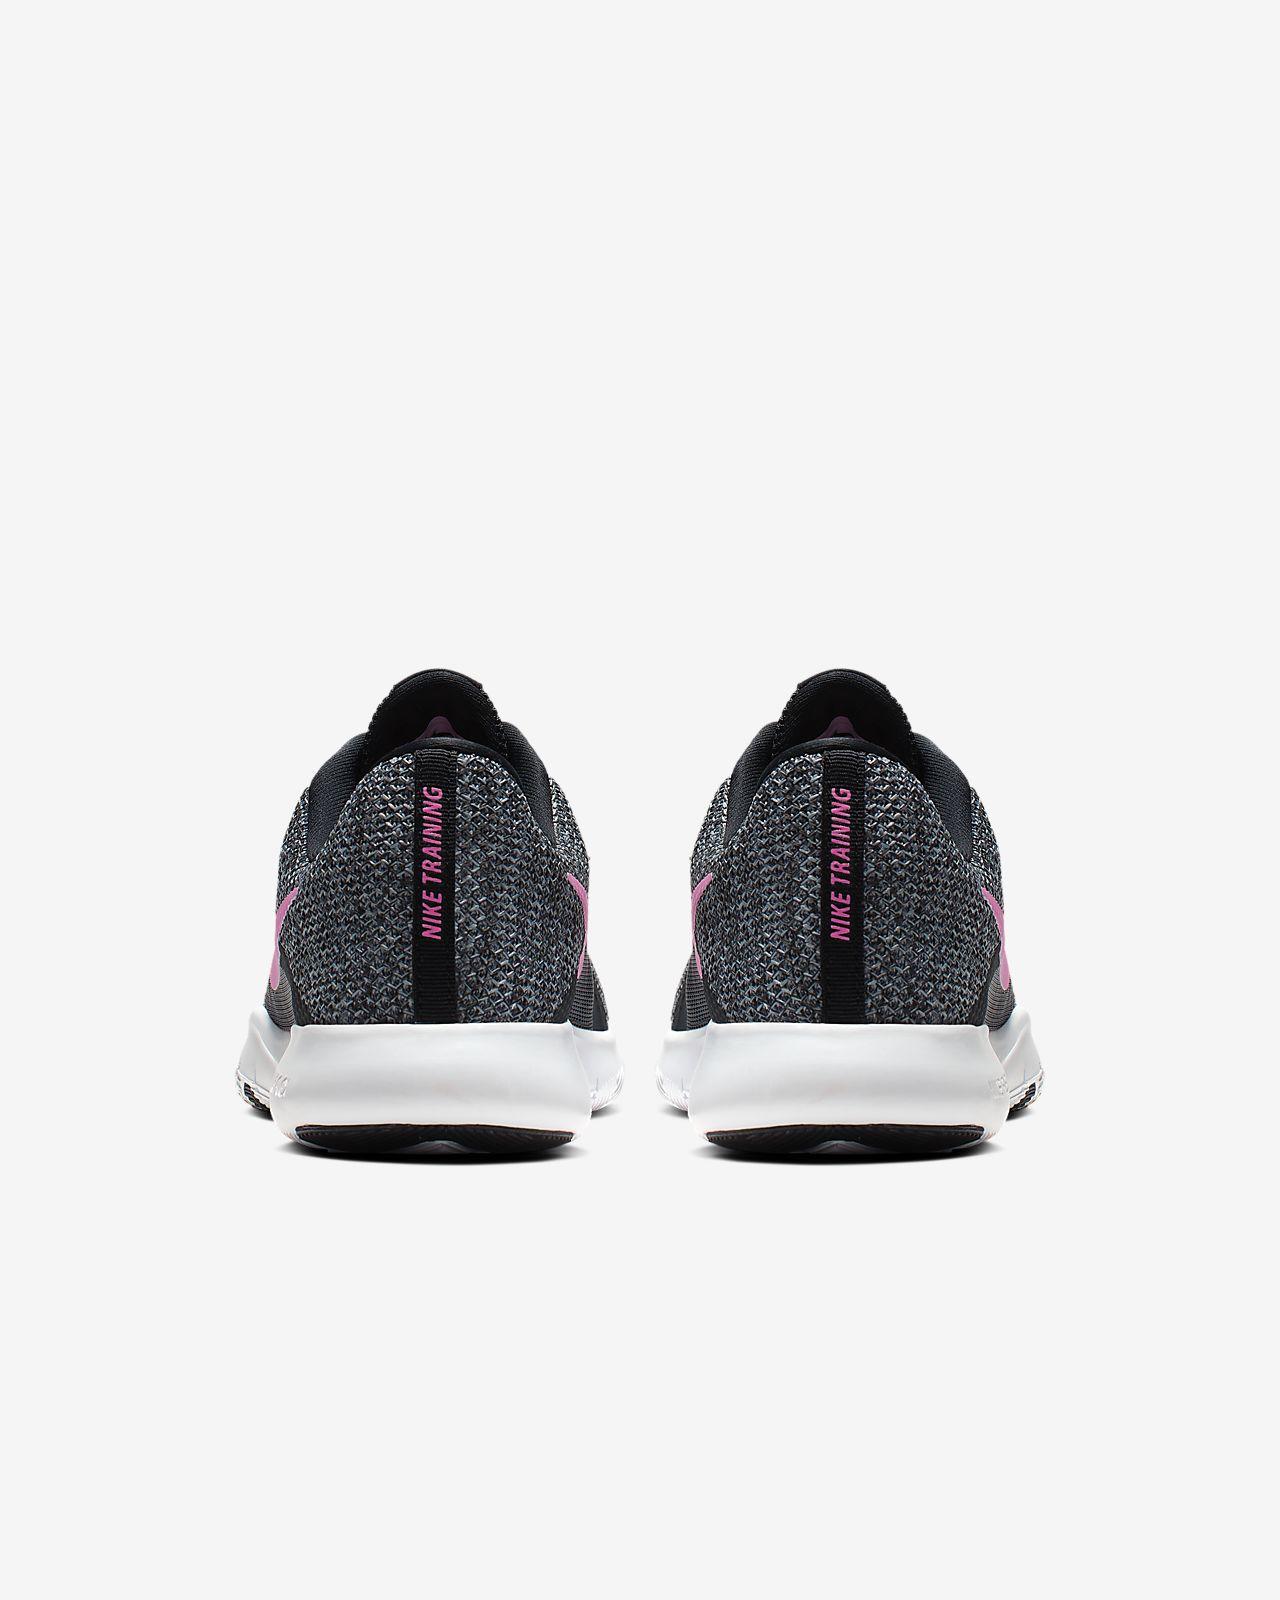 737040ea6f2 Calzado de entrenamiento para mujer Nike Flex TR8. Nike.com CL